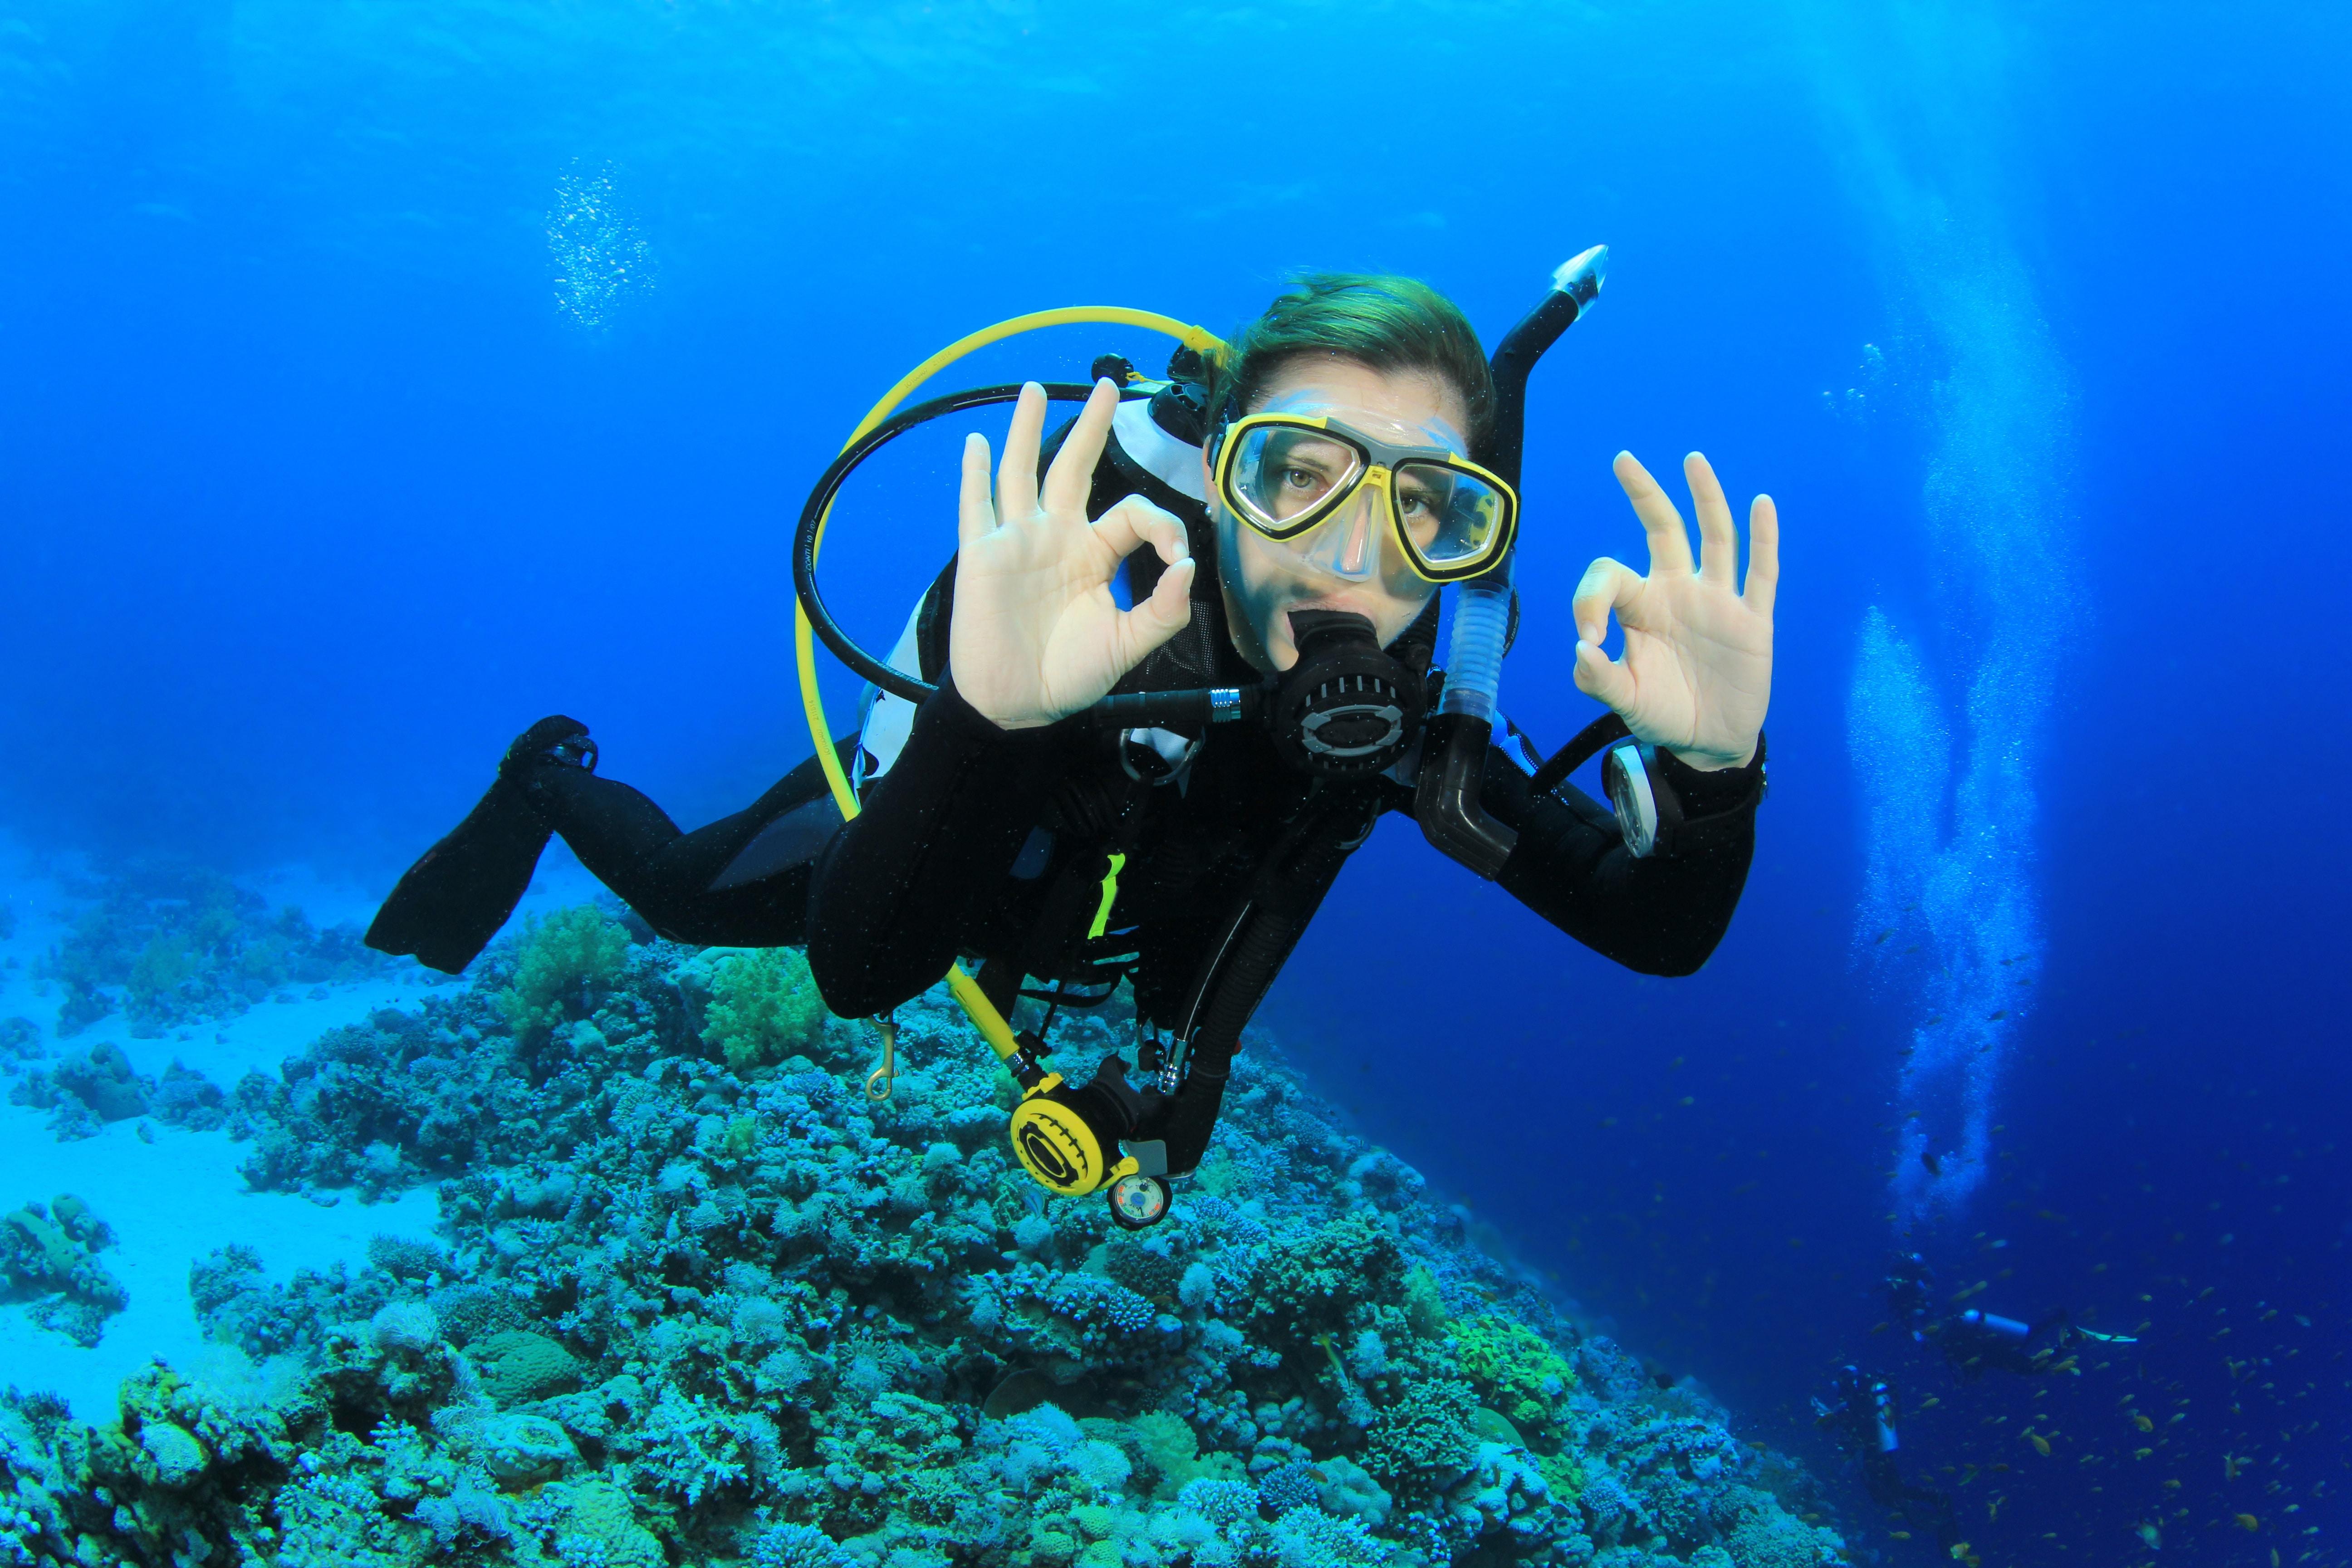 High Resolution Wallpaper | Diving 5184x3456 px